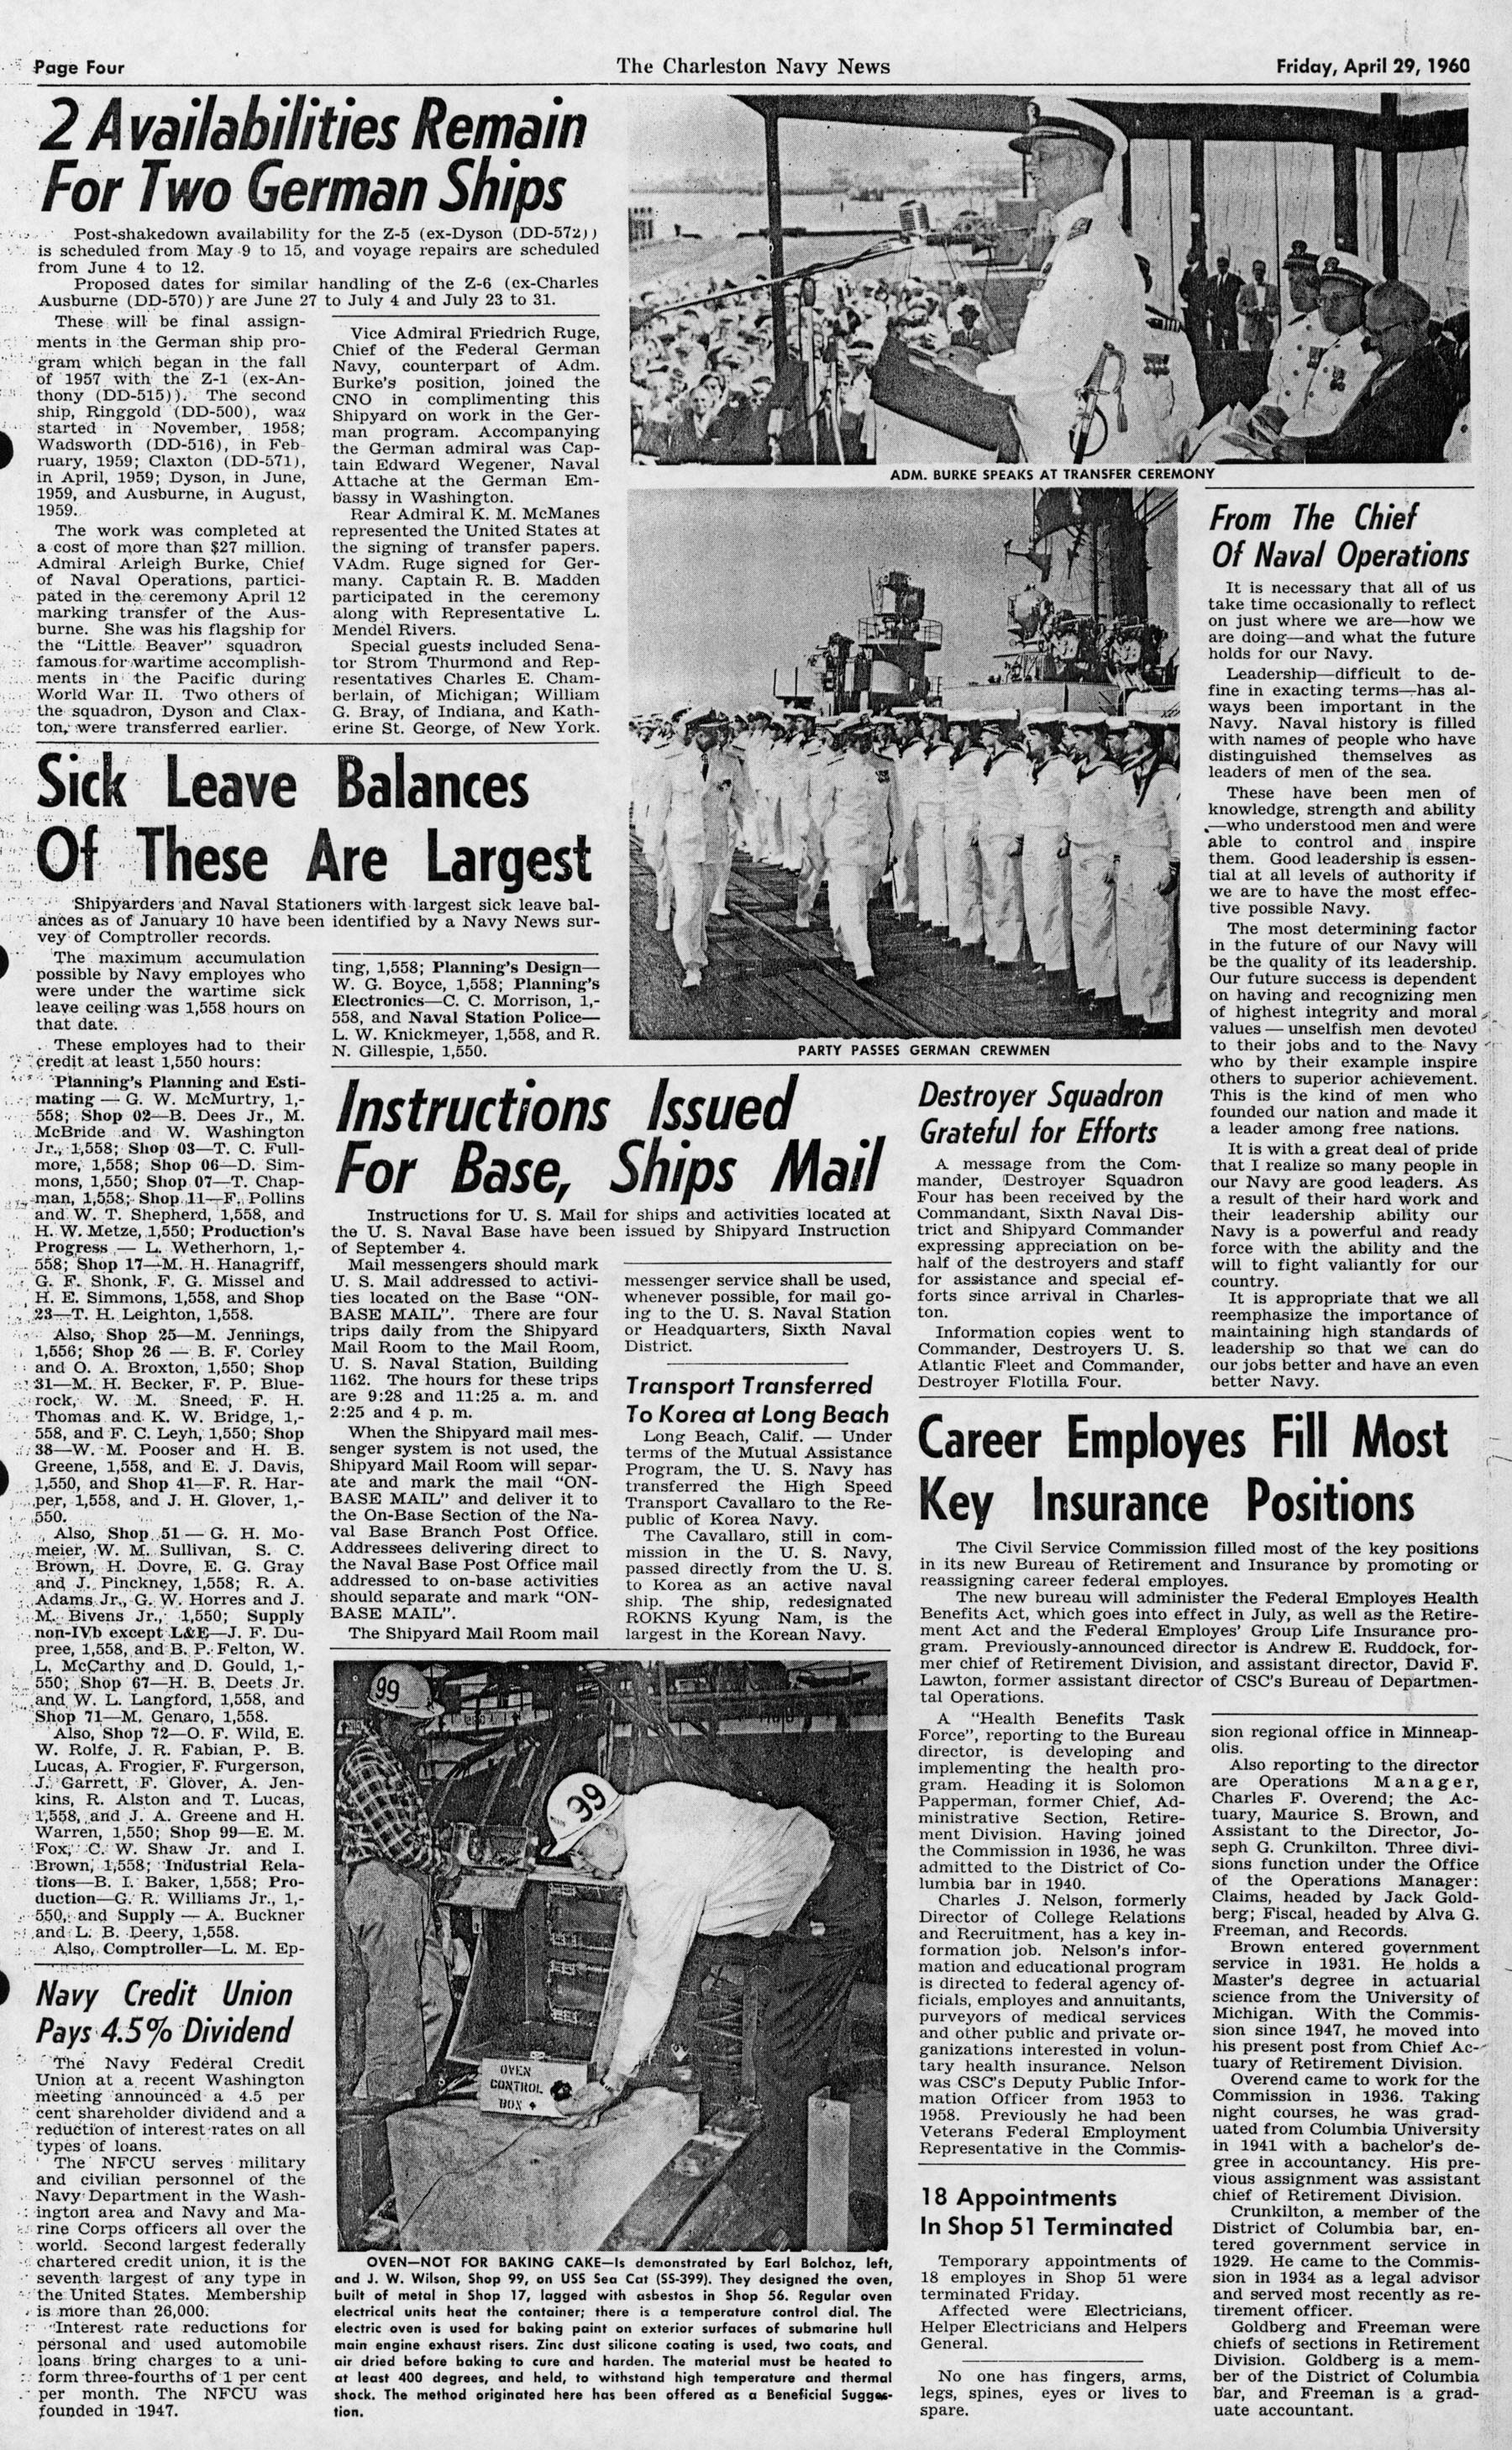 The Charleston Navy News, Volume 18, Edition 21, page iv